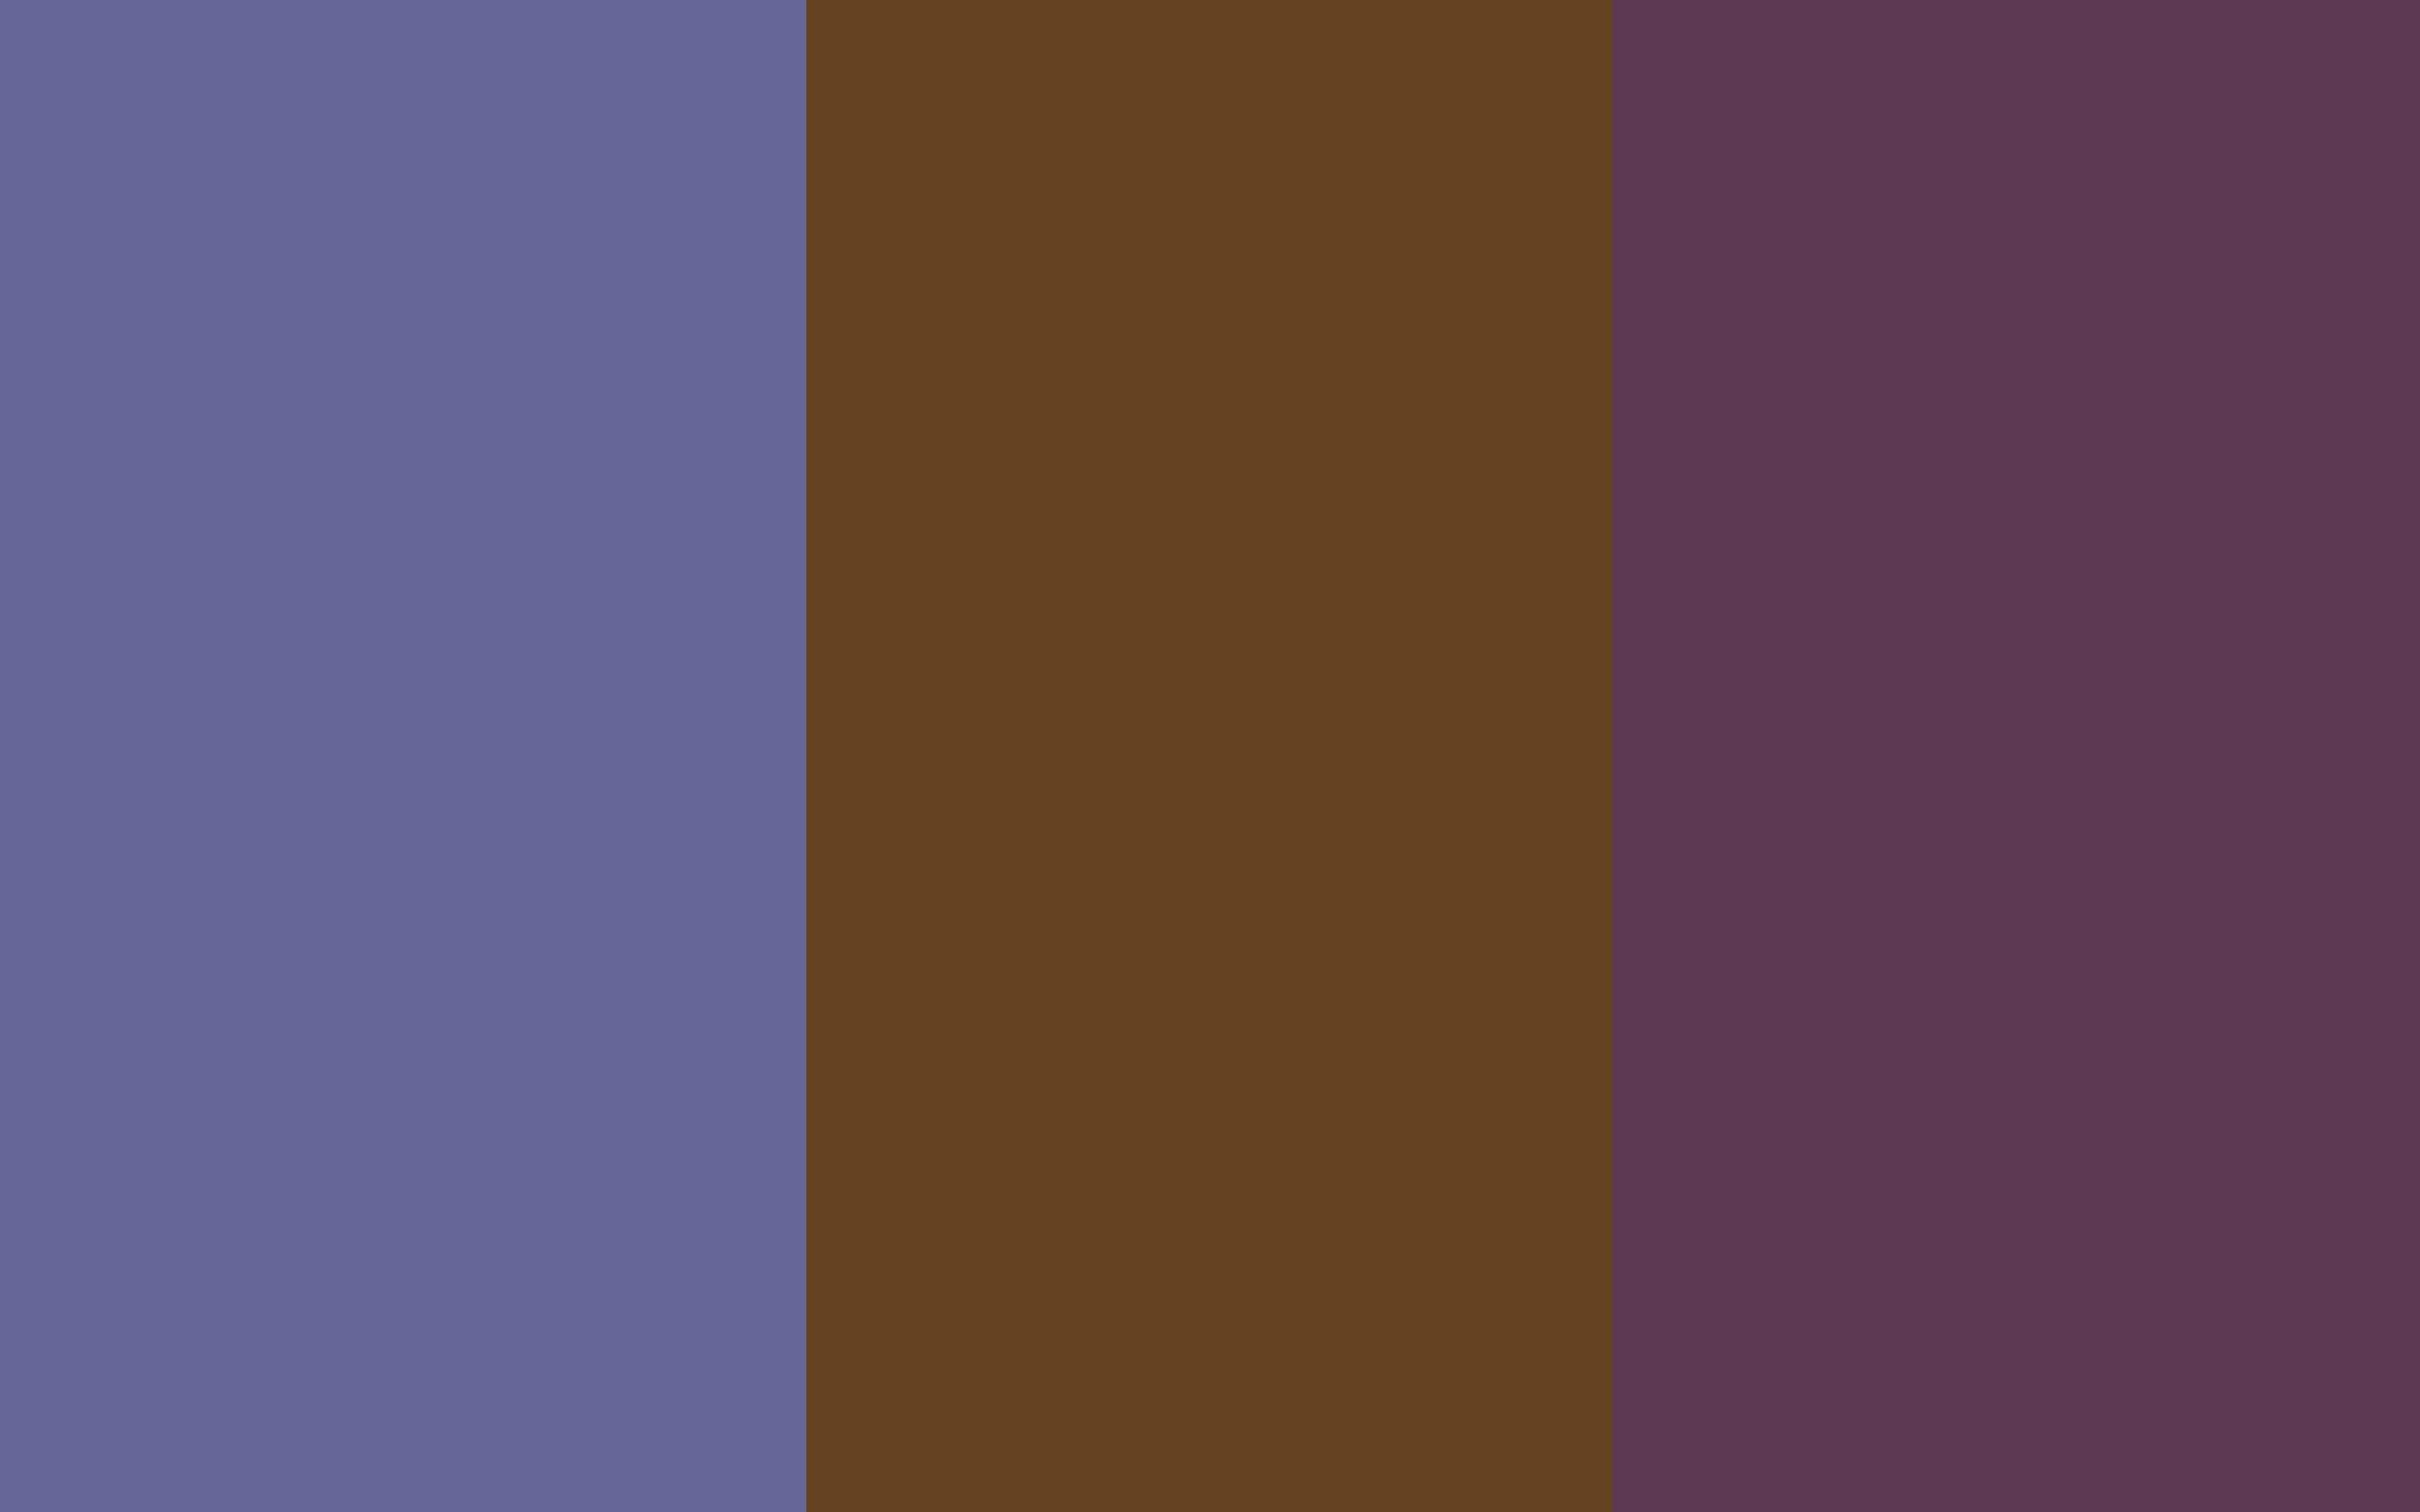 Pictures dark purple black background by l jpg wallpaper 8cyj6 jpg 2560x1600